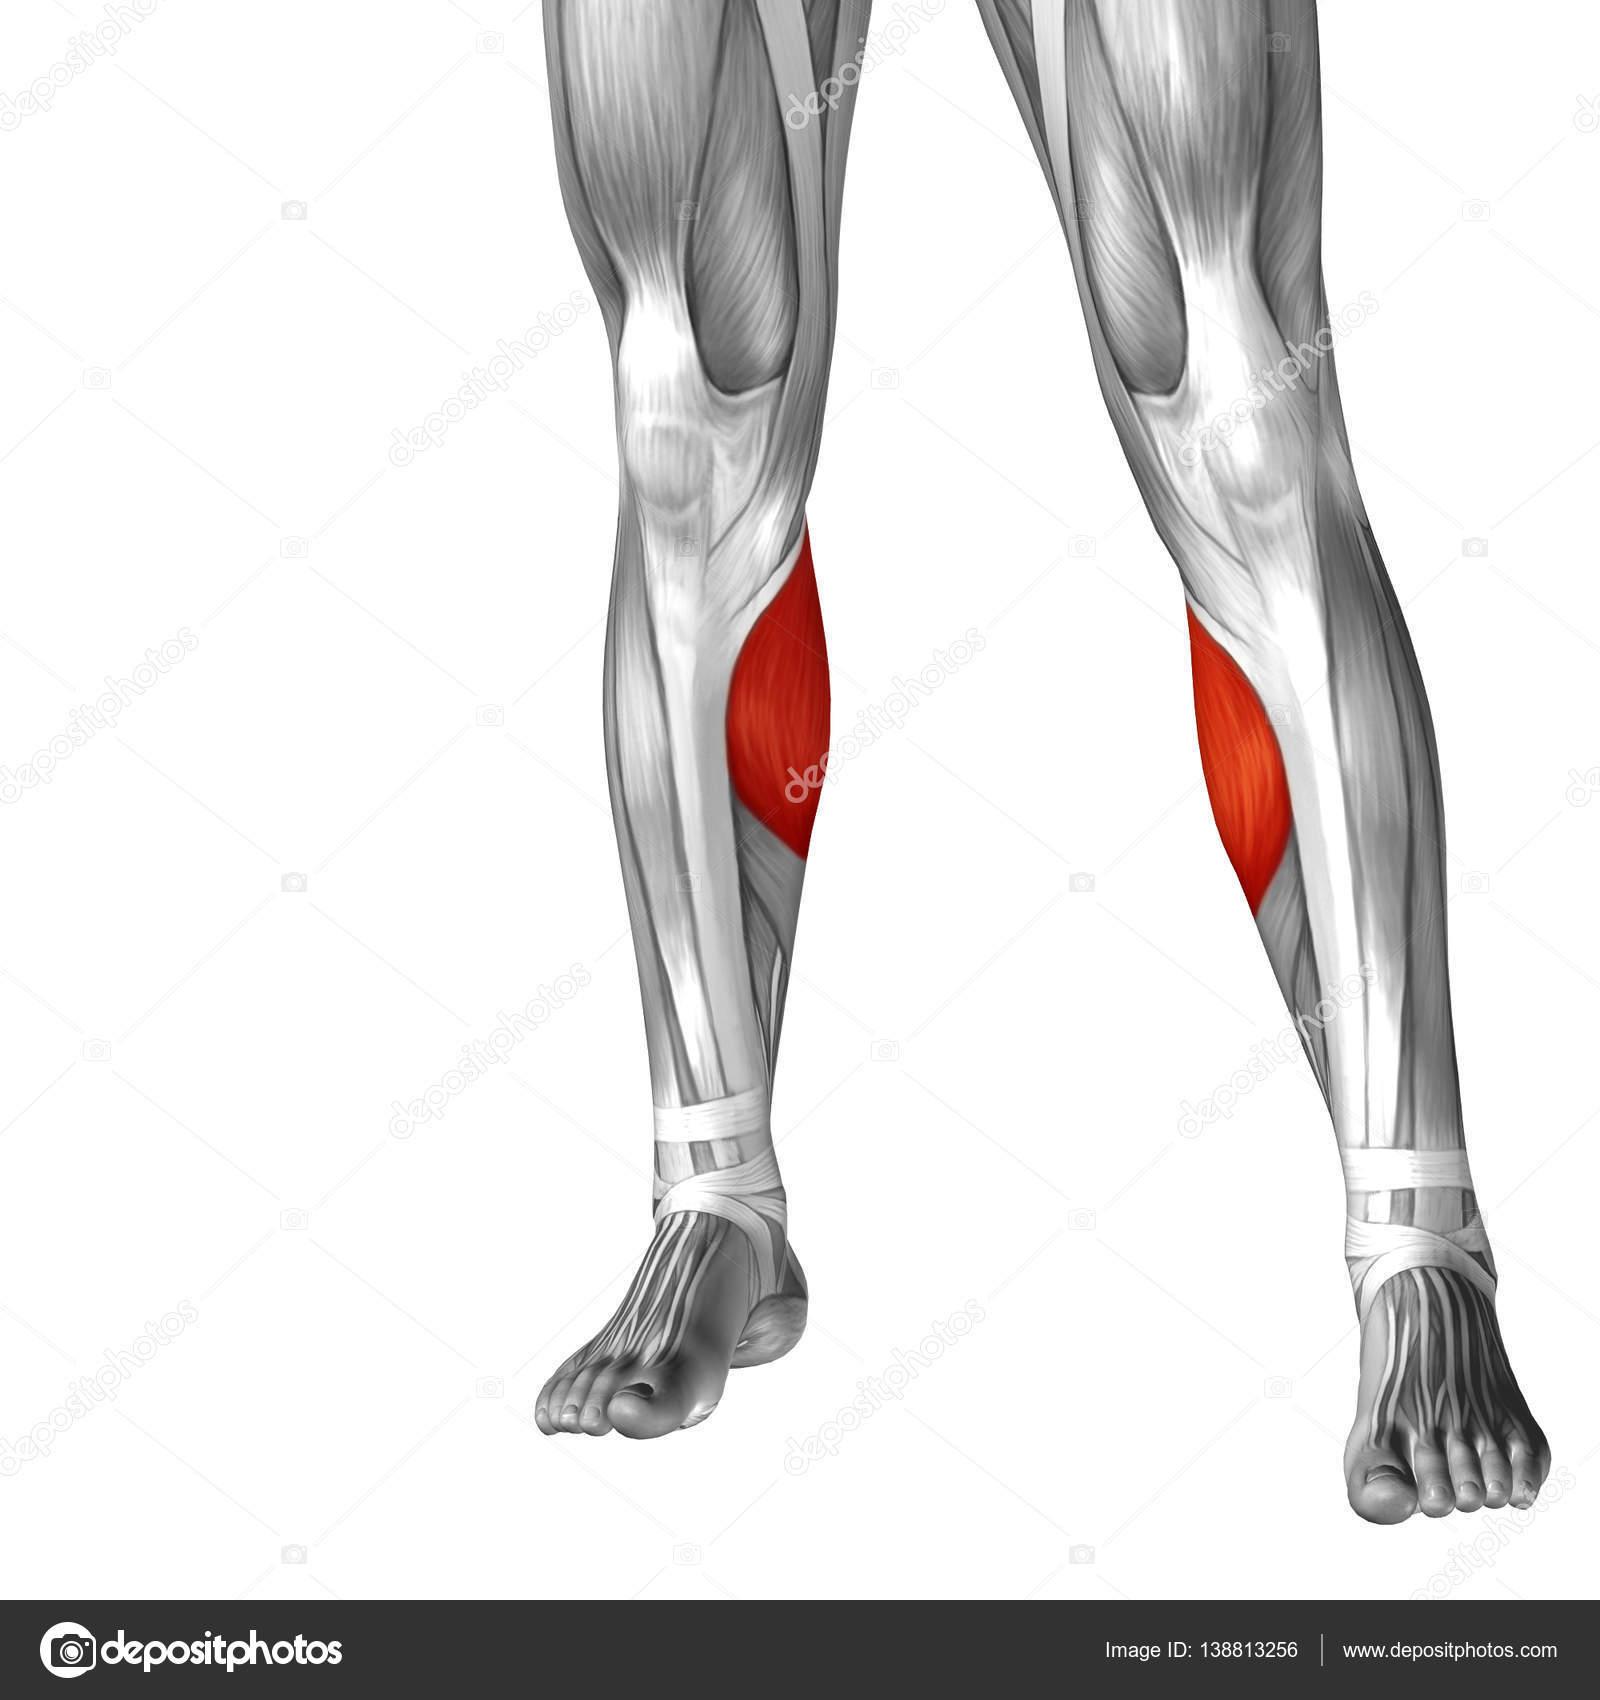 Human Lower Leg Anatomy Stock Photo Design36 138813256